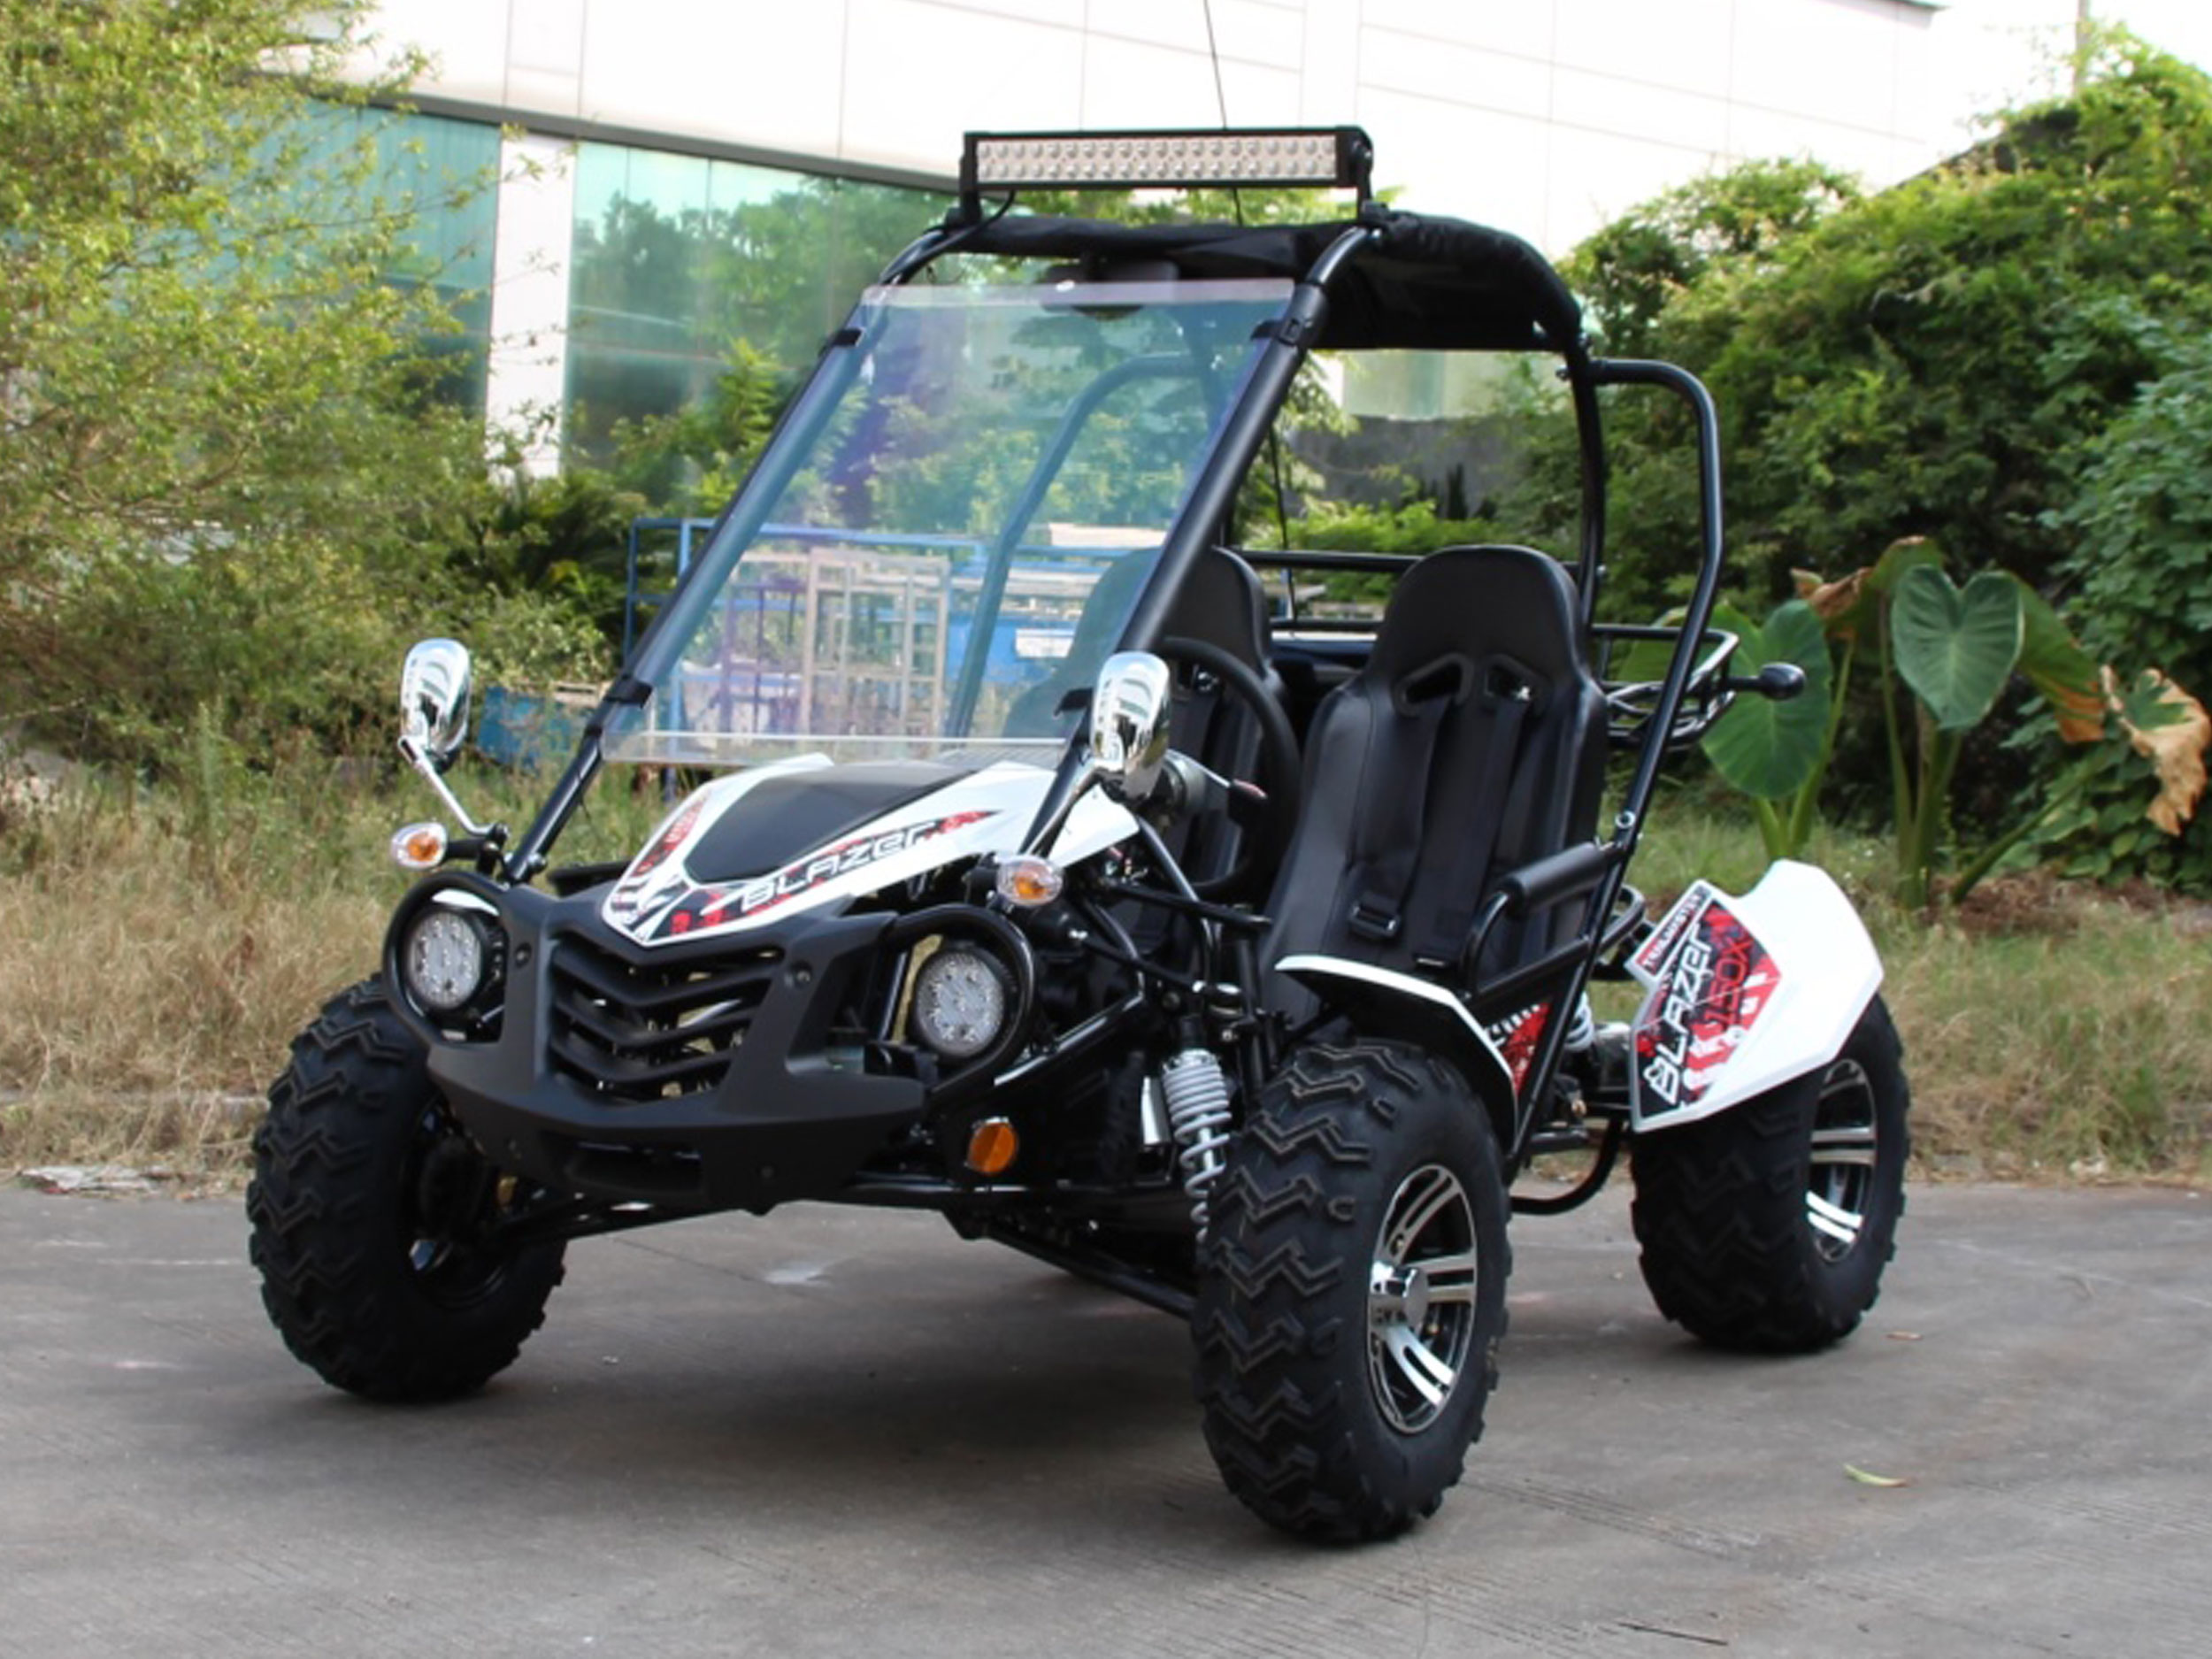 Trailmaster Blazer 150 X (Two Seat Go Kart)